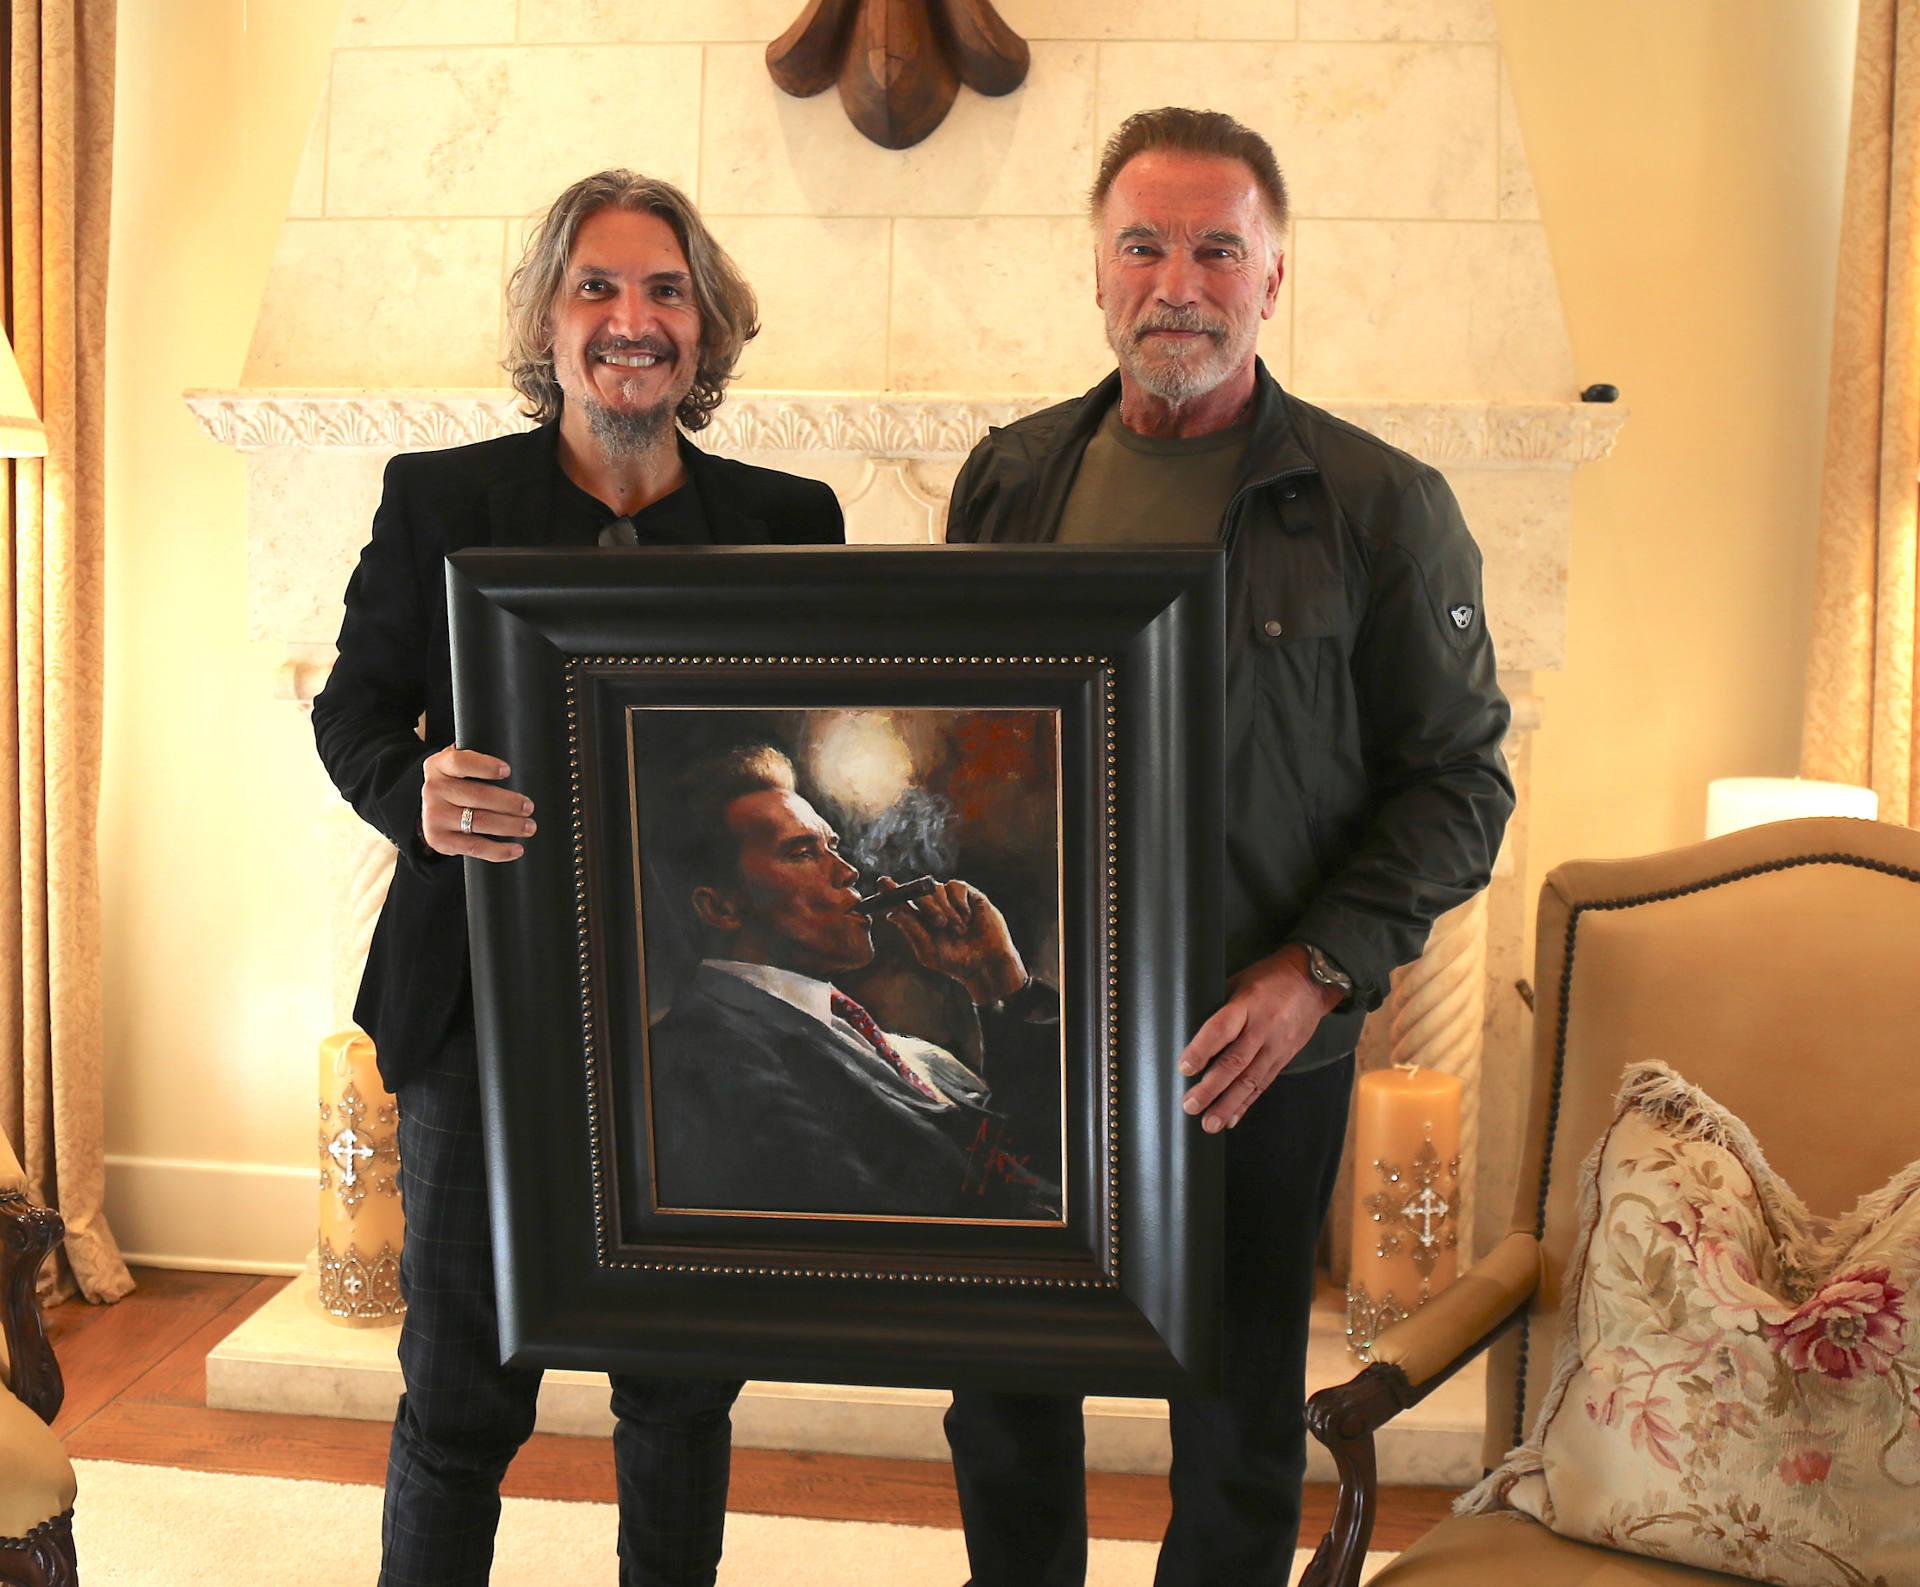 Arnold Schwarznegger holding portrait next to Fabian Perez